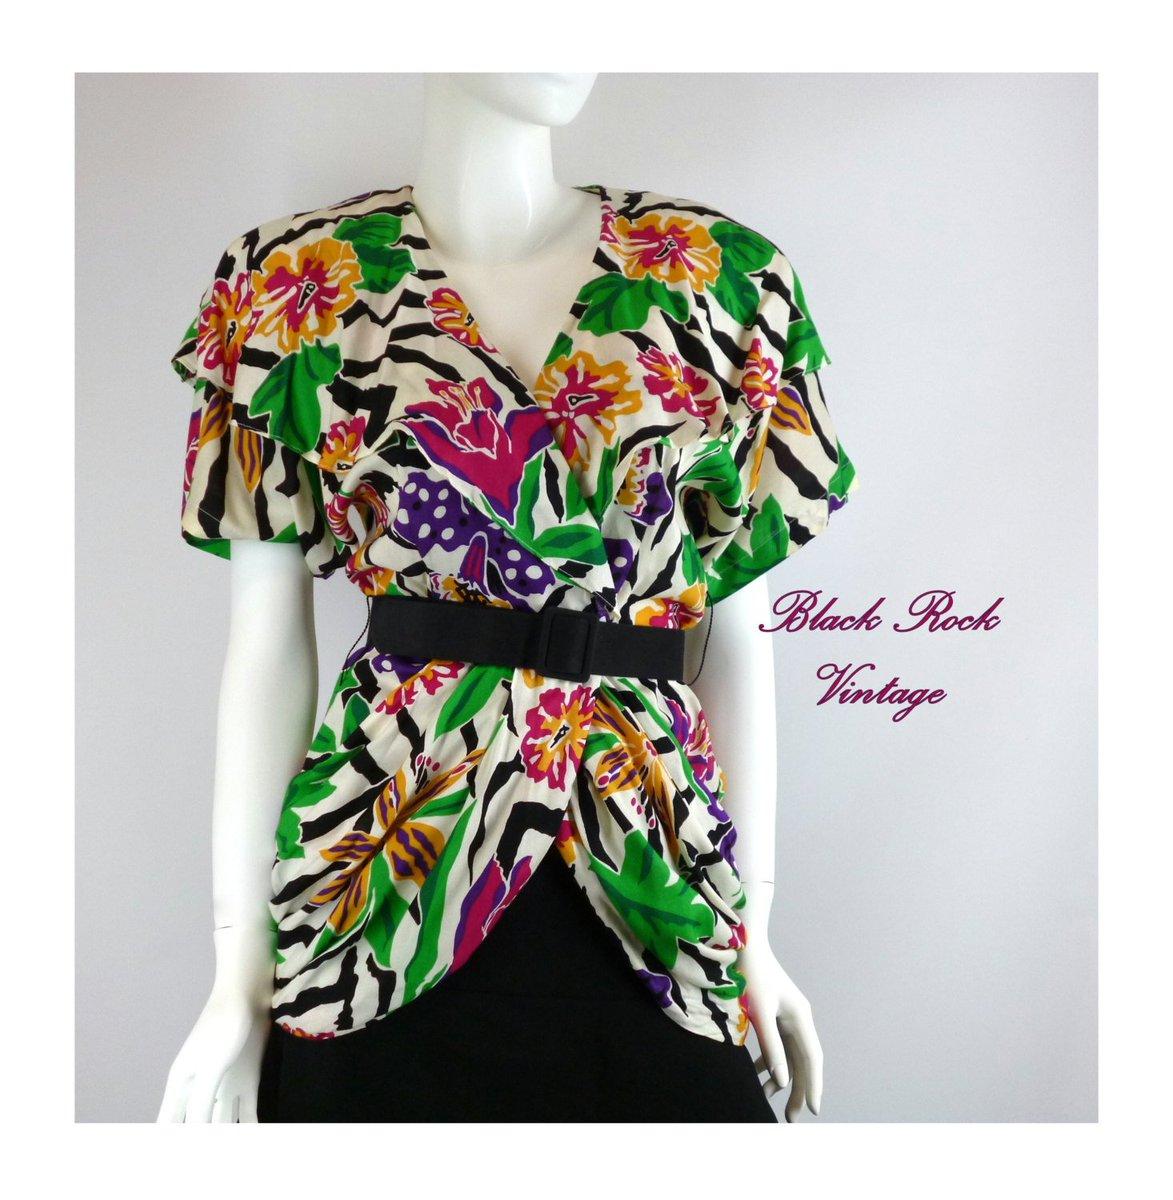 Floral Jacket Tropical Print, Jewel Tones Shawl Collar, Vinta… http://etsy.me/2rvVE76 #VintageDresses #DrapedBlouse pic.twitter.com/JX6Zocv36w